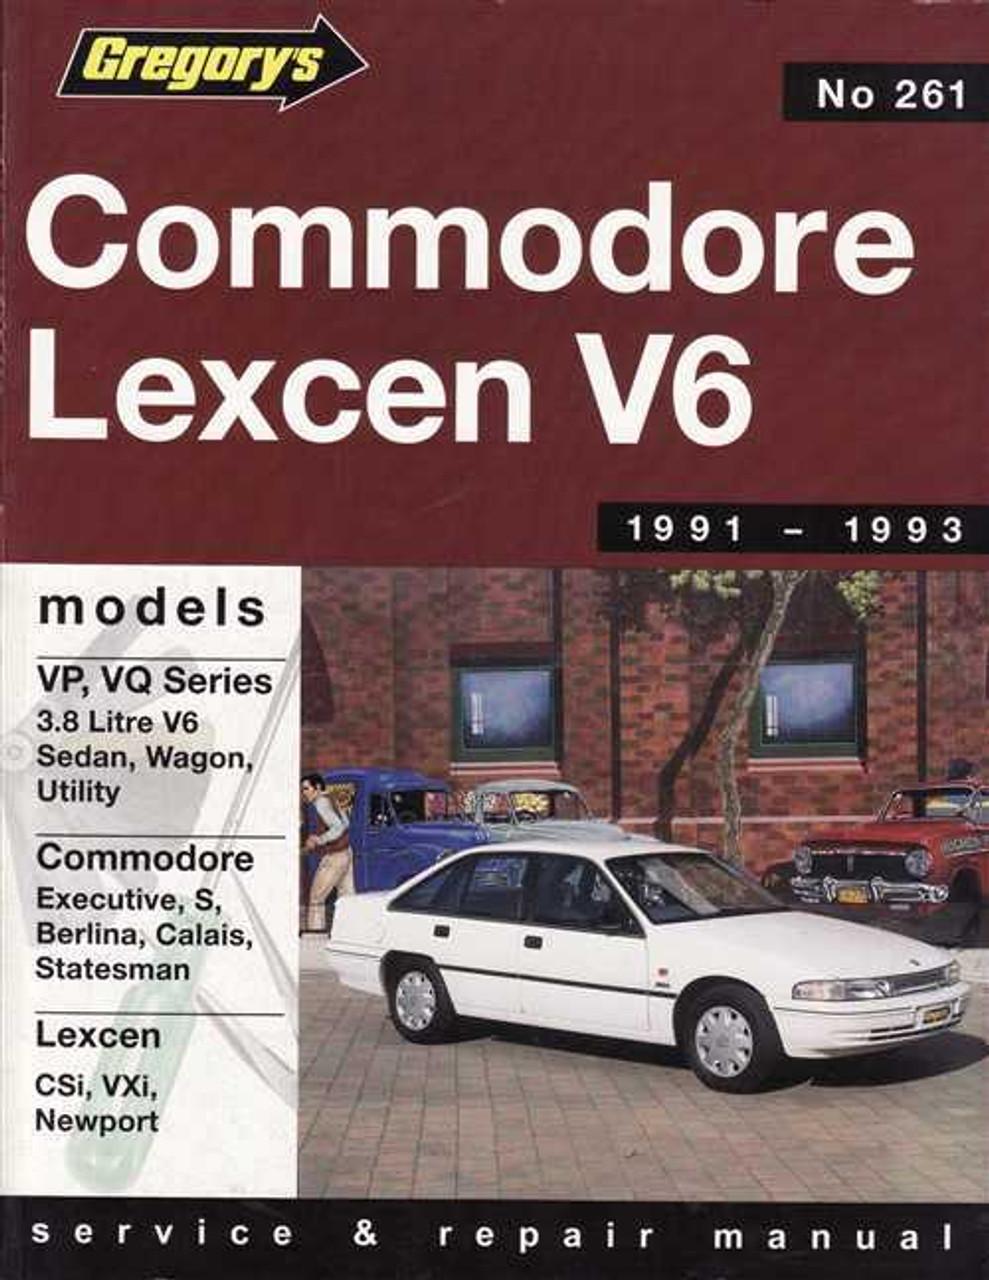 holden commodore amp toyota lexcen v6 1991 1993 workshop manual rh automotobookshop com au 1981 Holden Statesman holden vs commodore workshop manual